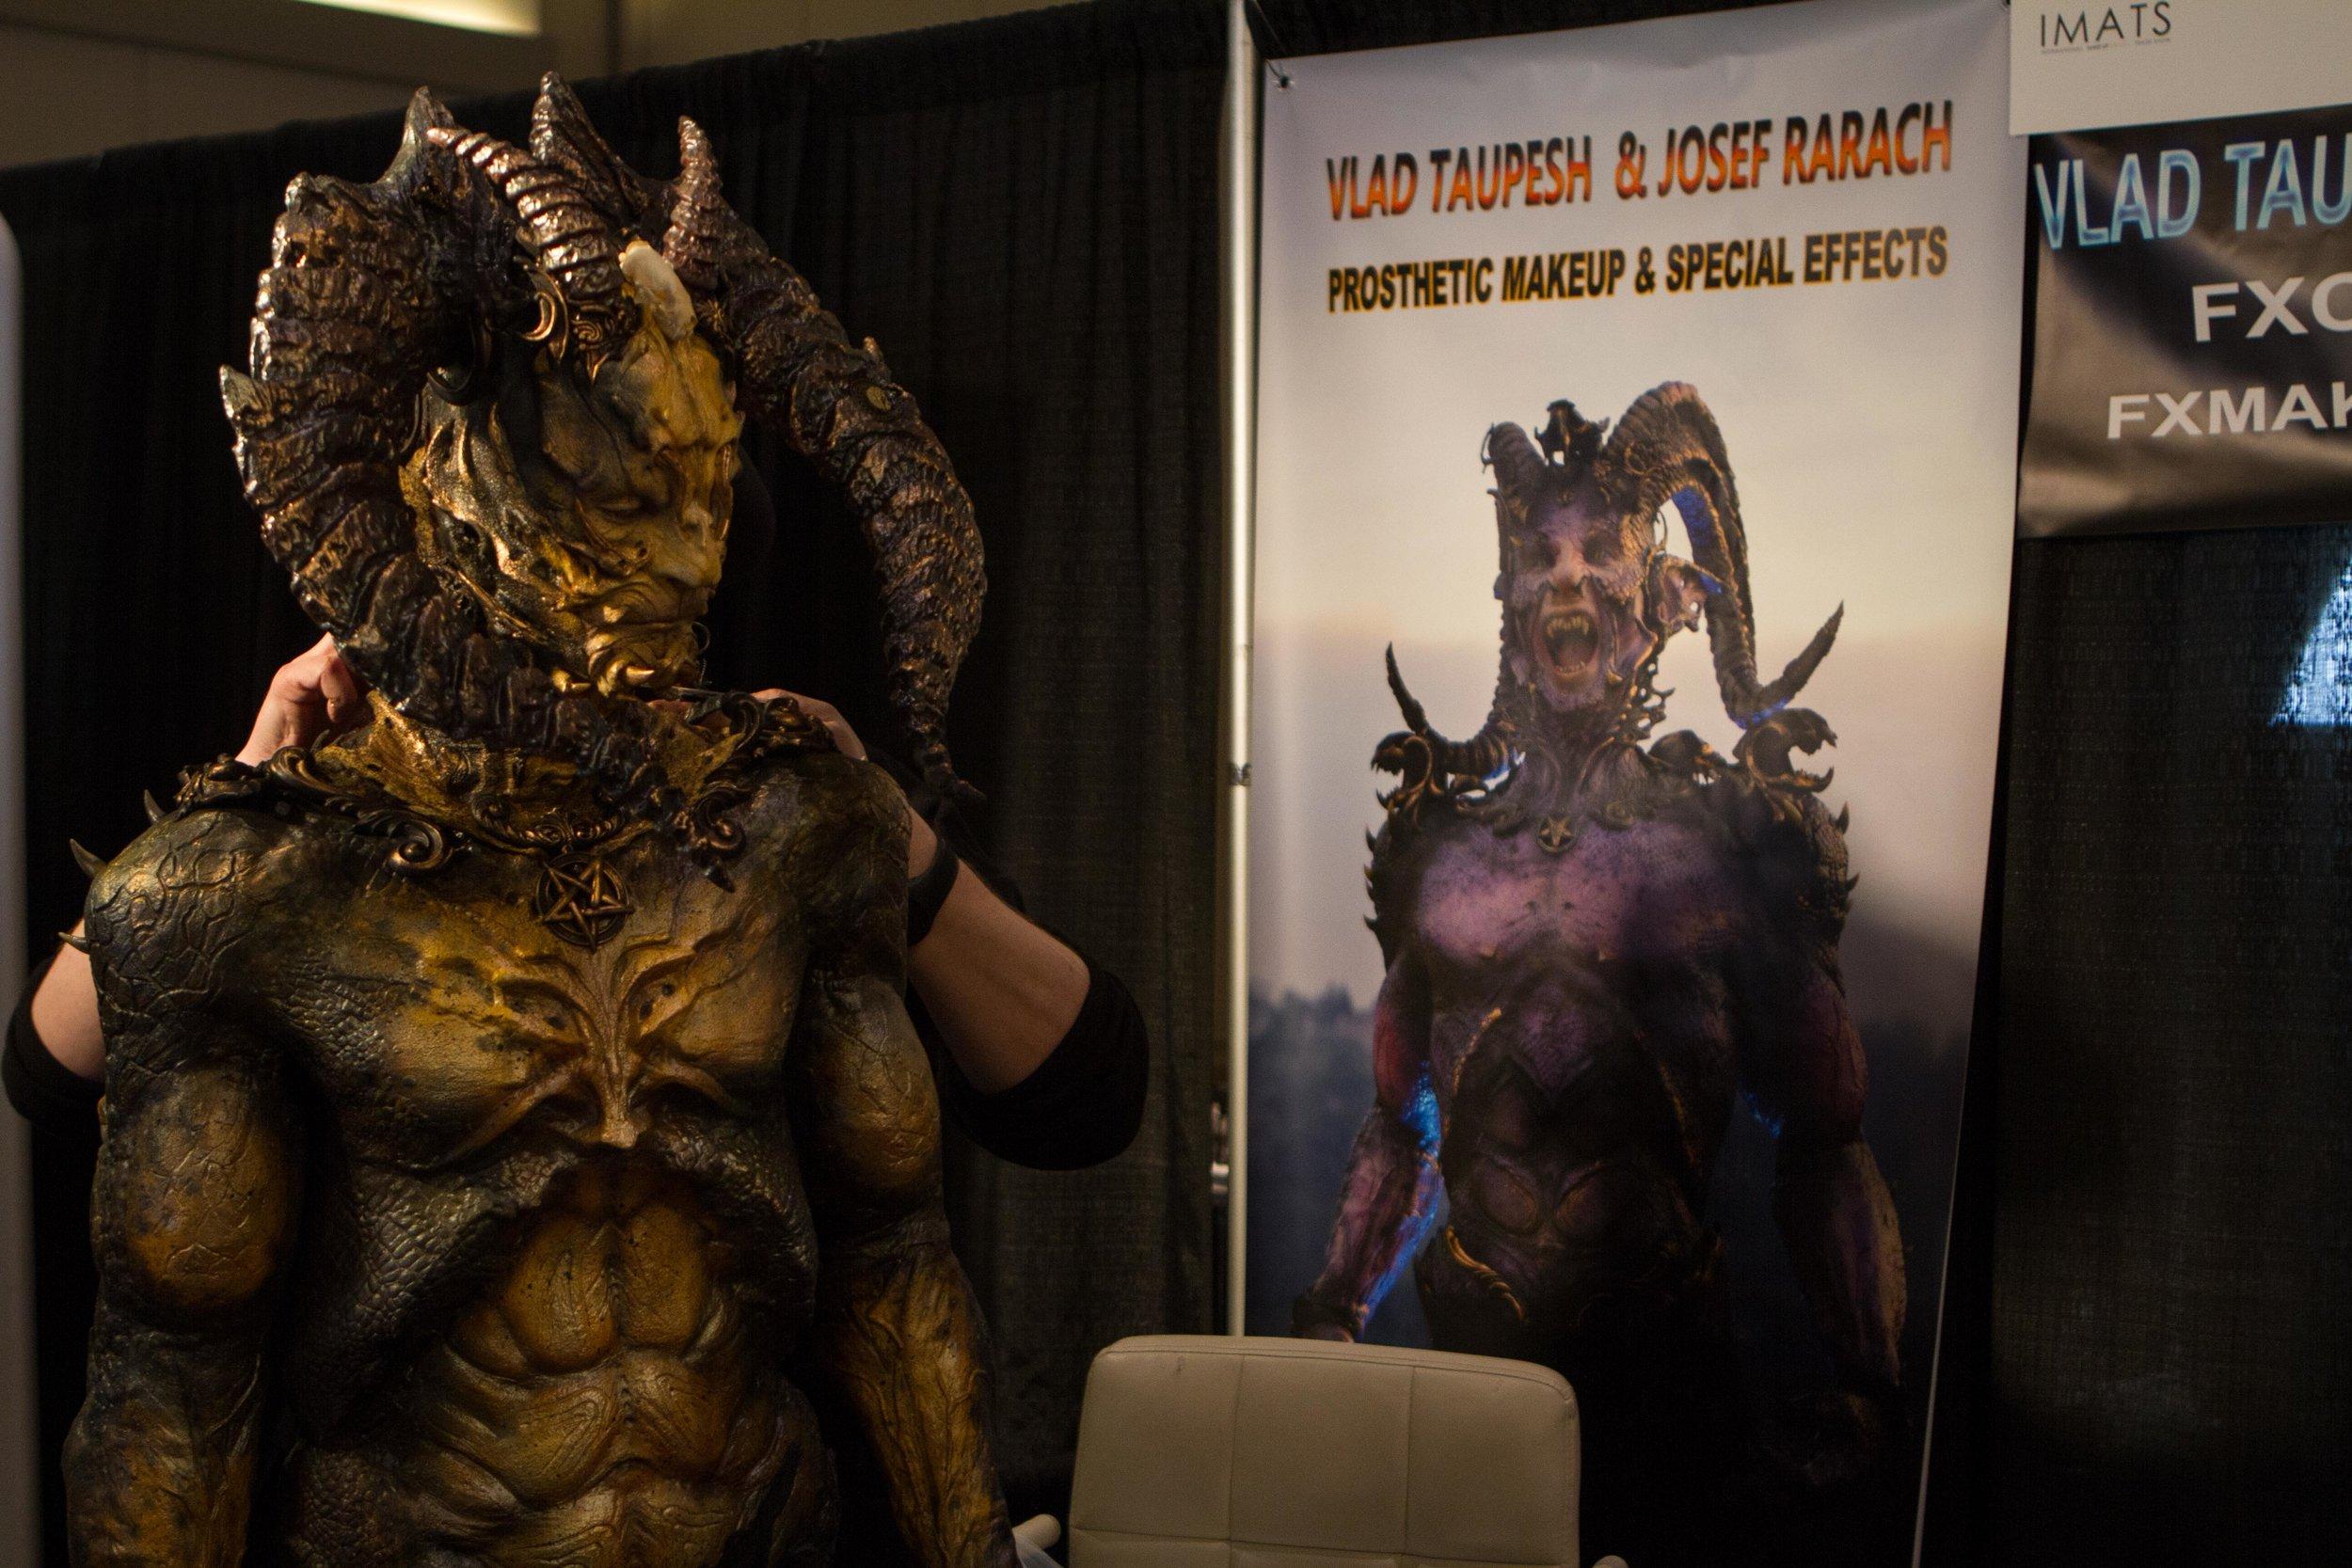 IMATS 2017 - FX Creator Josef Rarach & Vlad Taupesh Fantasy Special Effects Makeup (www.creativecastlestudios.com:fx-creator - www.KyleReaArt.com - www.KyleReaPhotography.com) 30.jpg